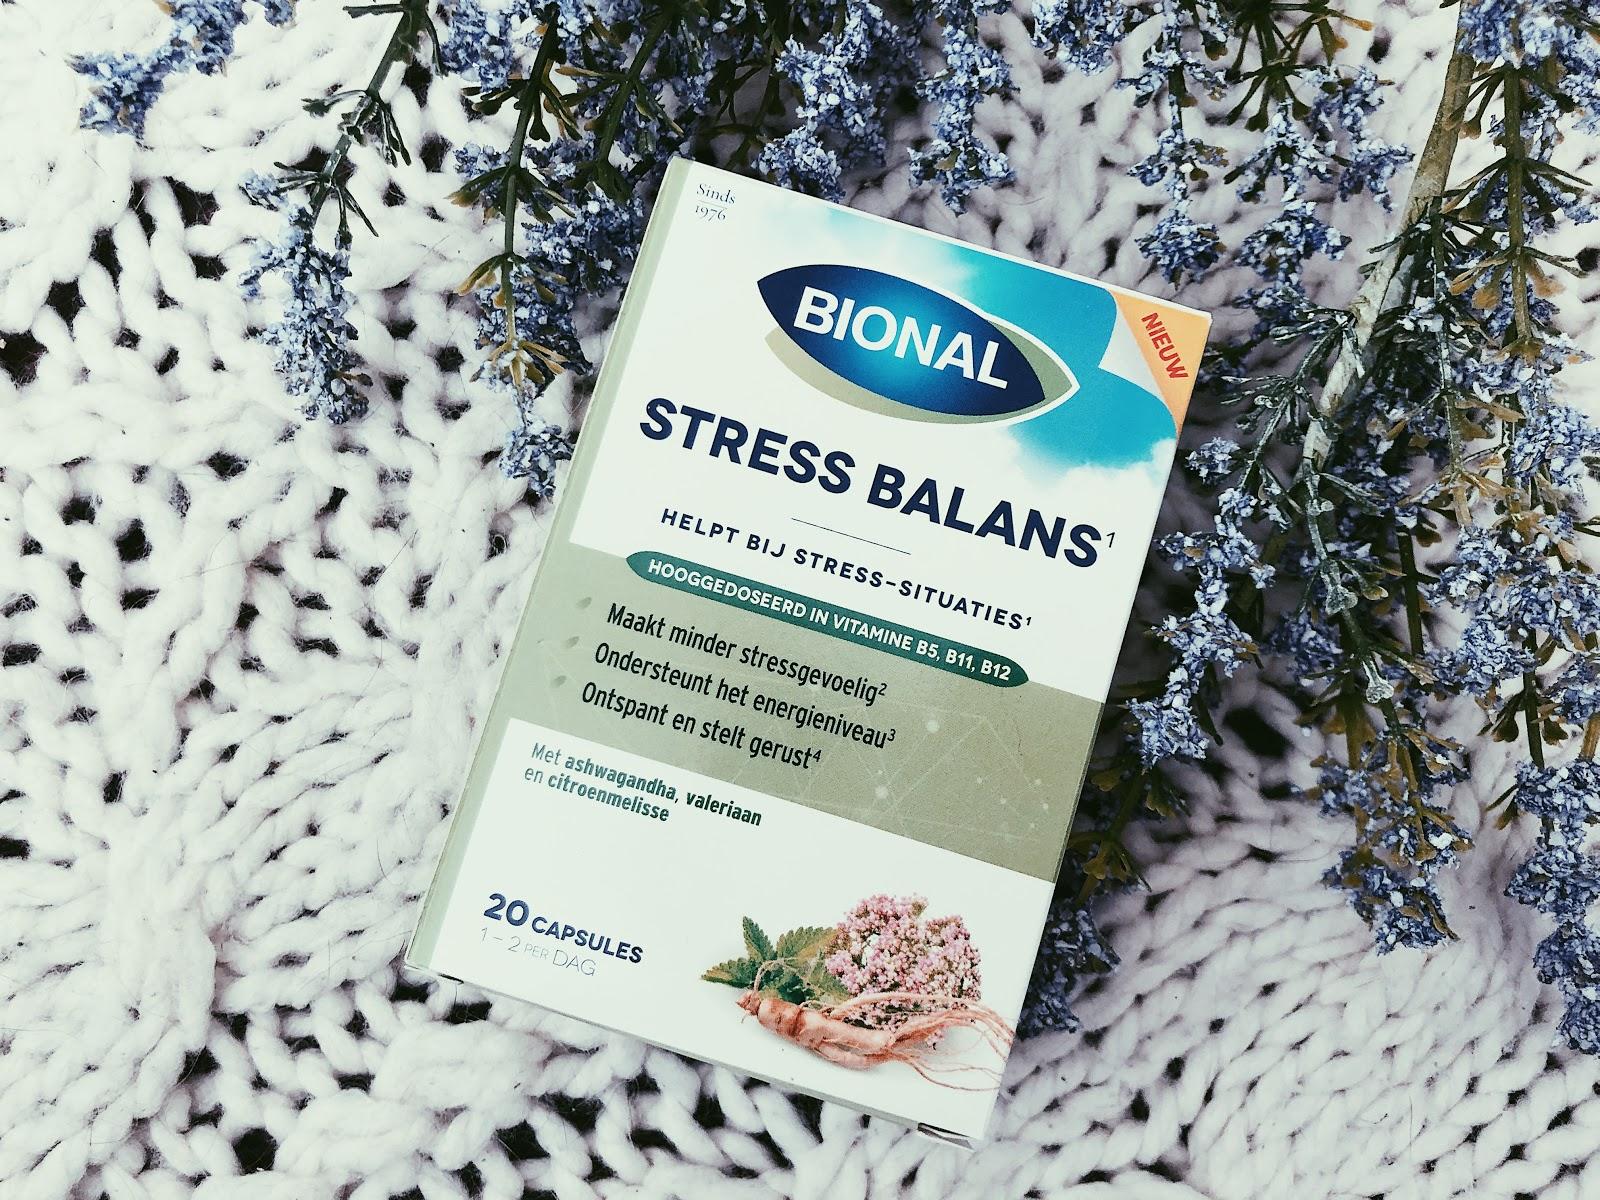 Pieker en stress momenten de baas met Bional Stress Balans